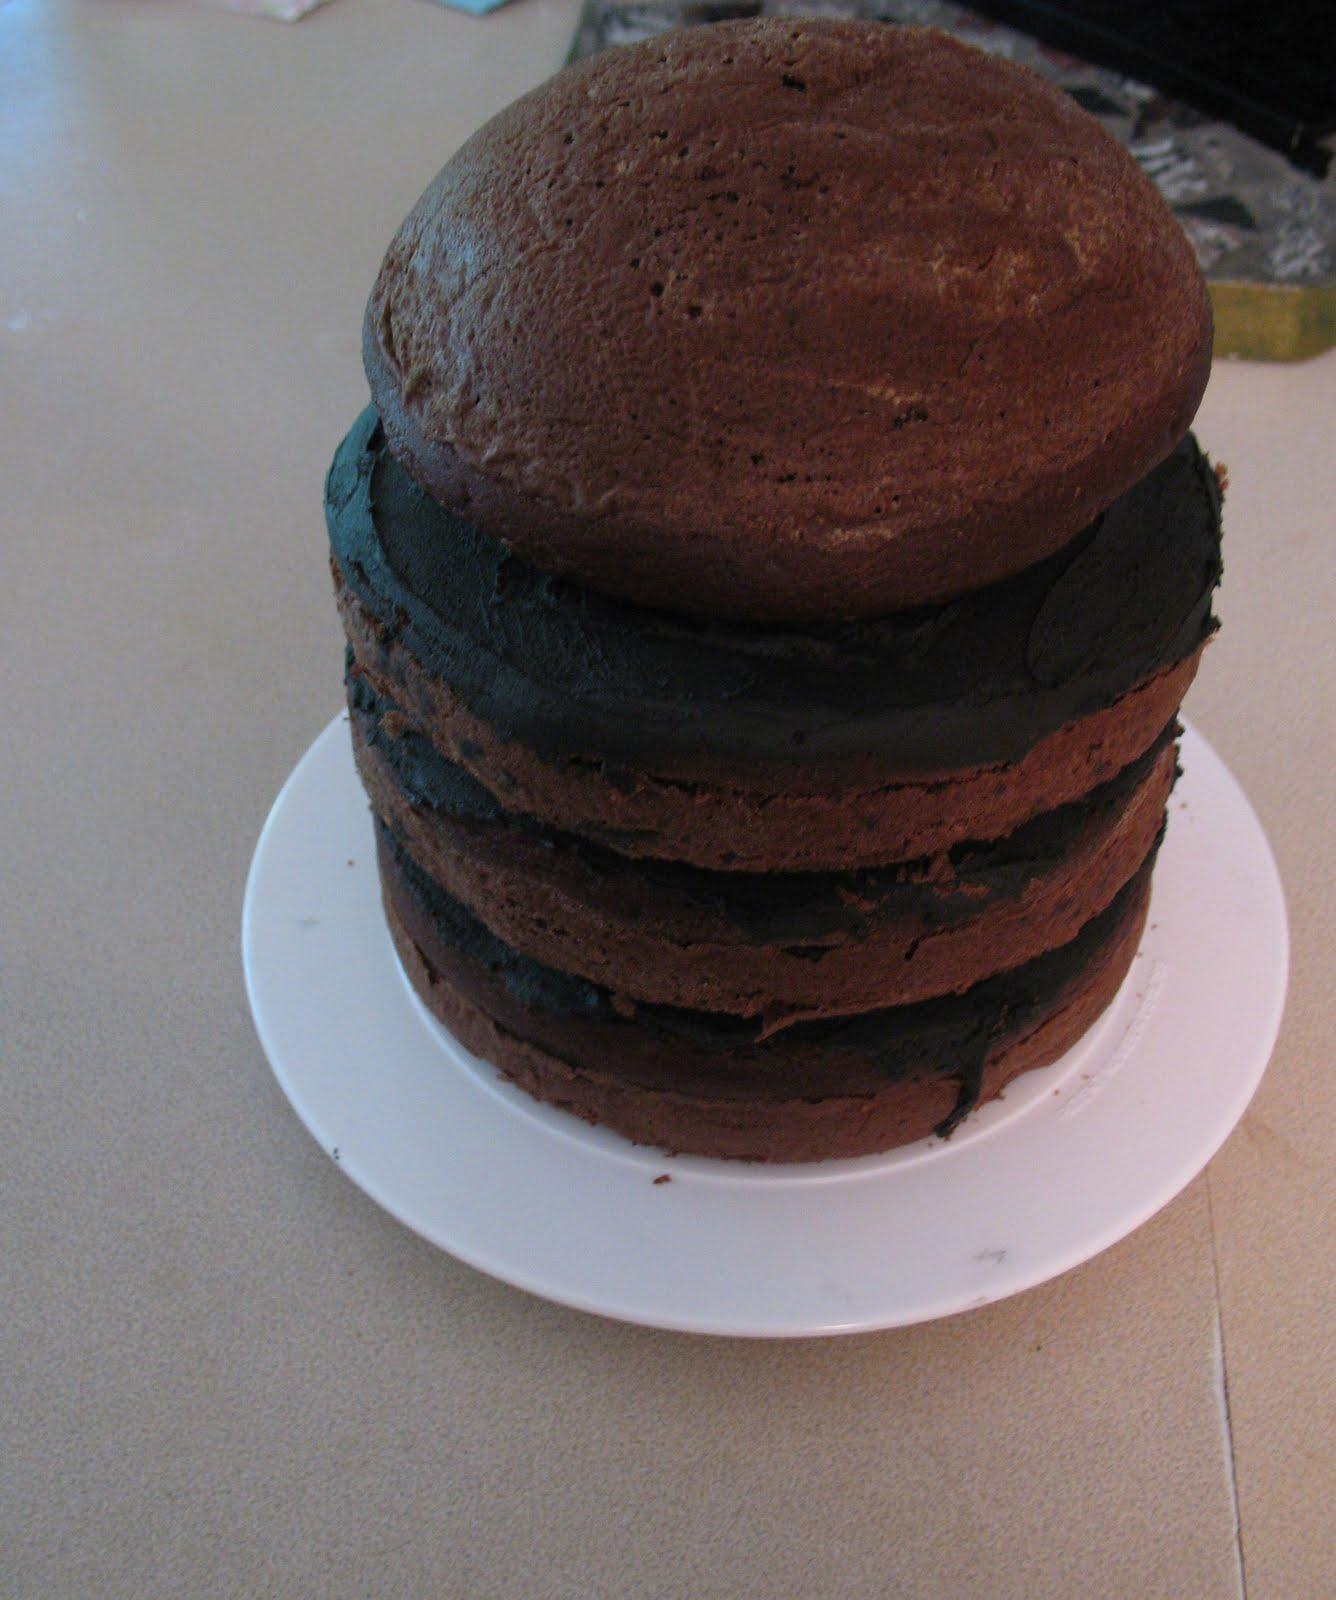 Chocolate Chewbacca Www Dunmorecandykitchen Com: Artist Unplugged: Let Them Eat Cake